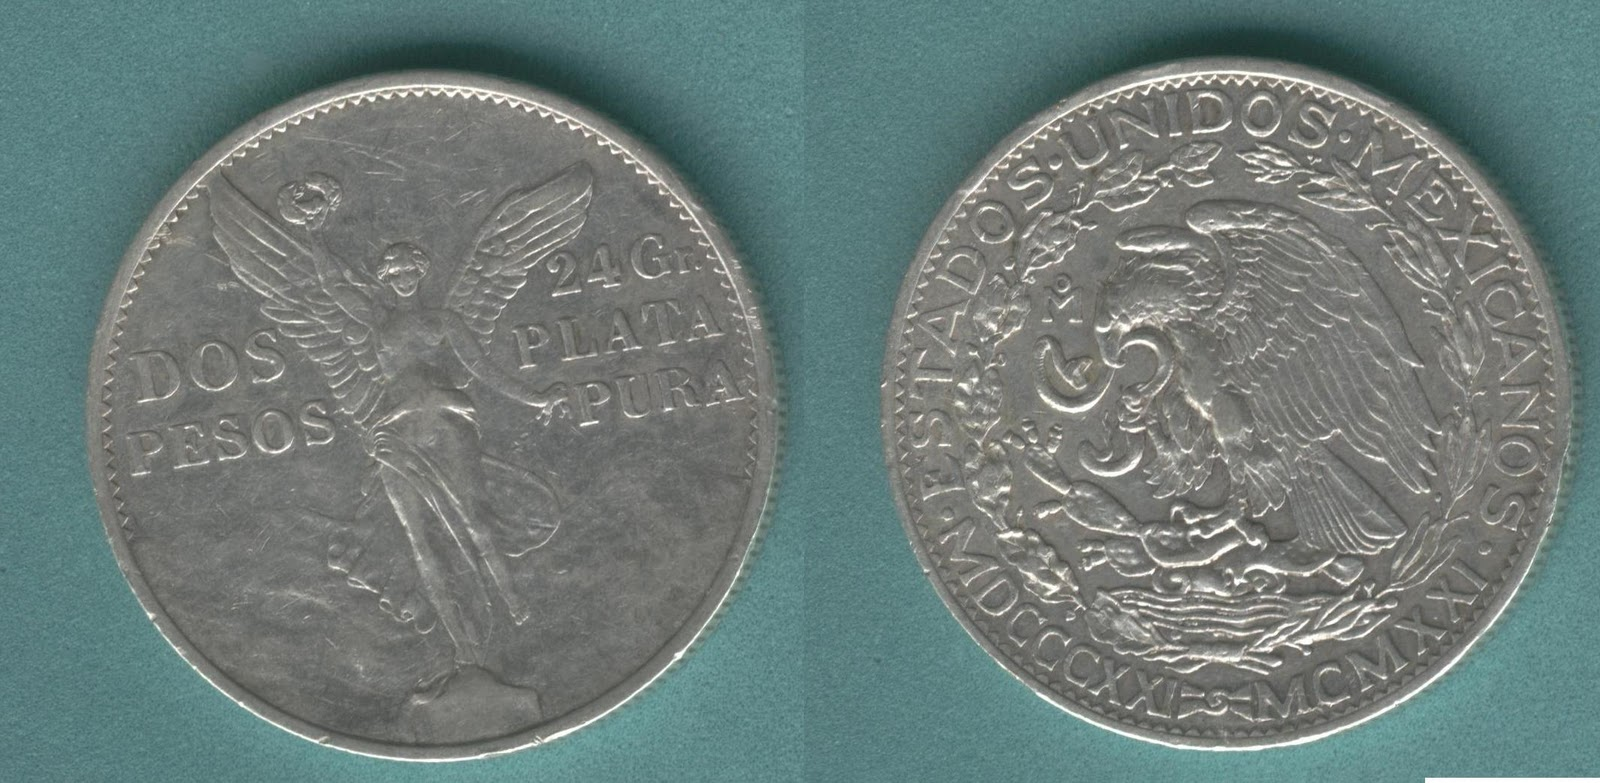 2 Pesos Ángel De La Independencia 1921 24 Grs Plata Pura